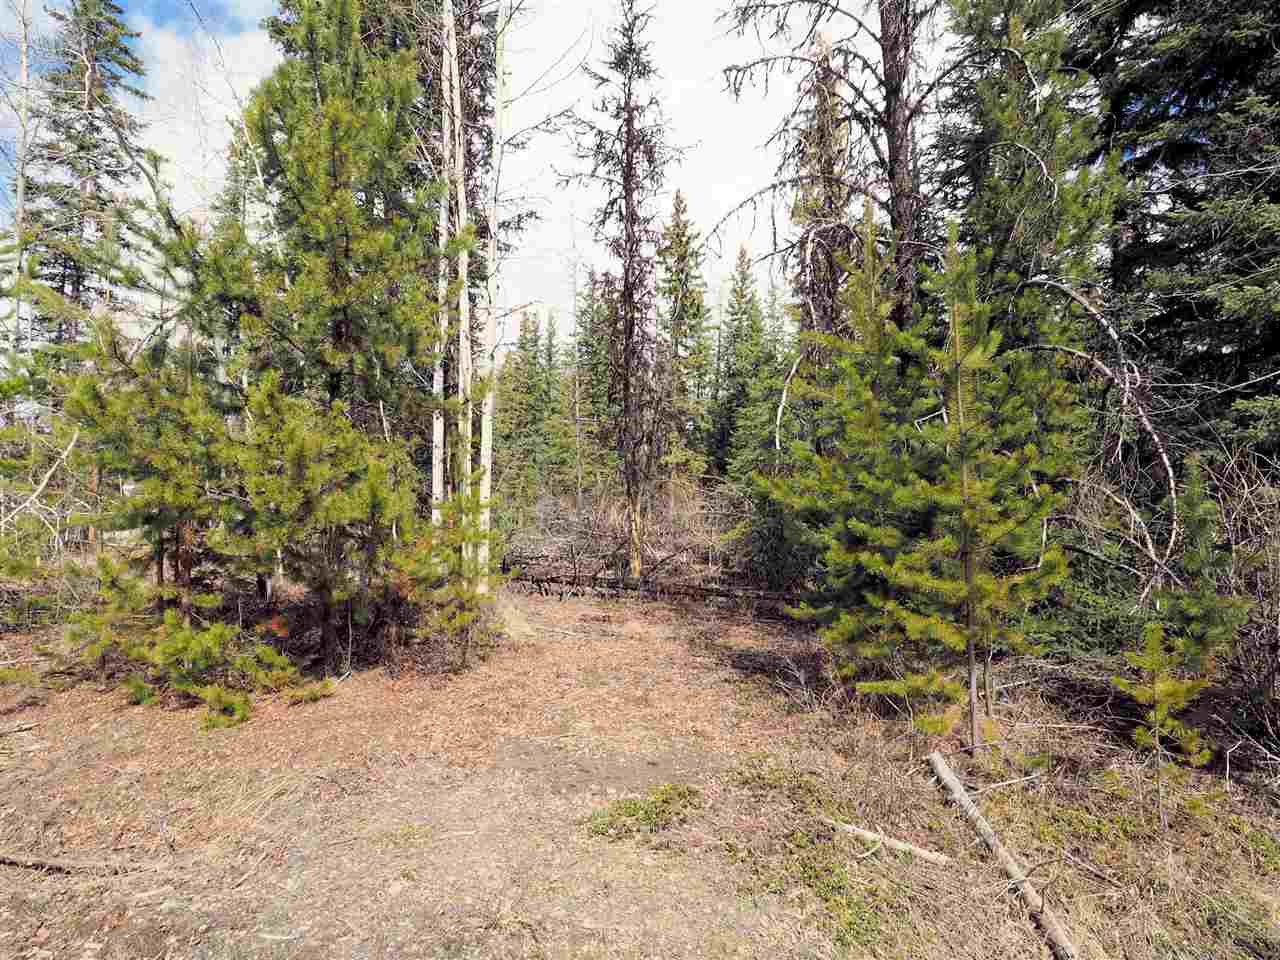 Photo 2: Photos: LOT 216 LUDLOM Road: Deka Lake / Sulphurous / Hathaway Lakes Land for sale (100 Mile House (Zone 10))  : MLS®# R2397846